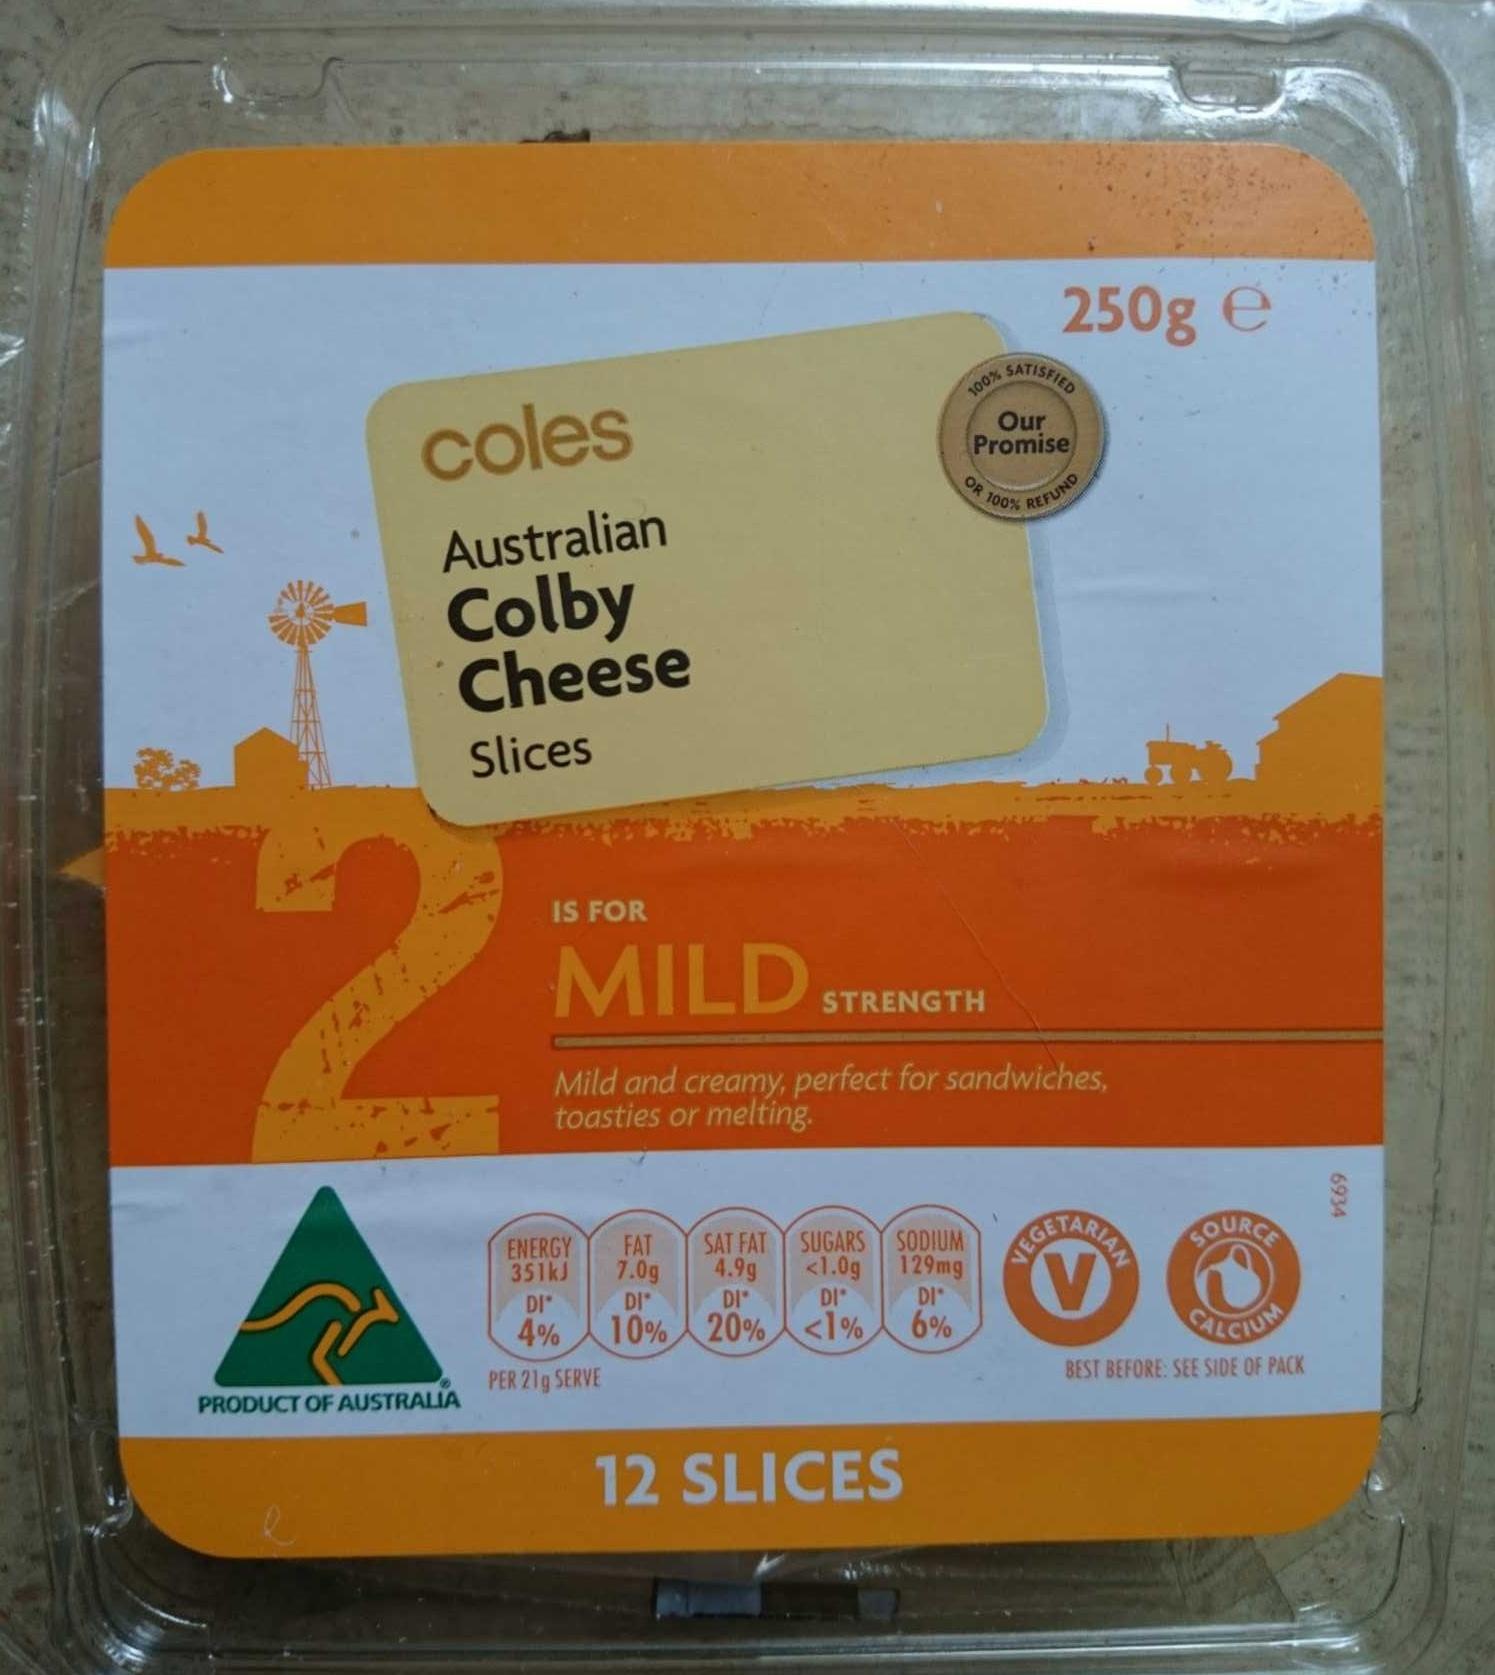 Australian Colby Chese Slices - Mild Strength - Product - en